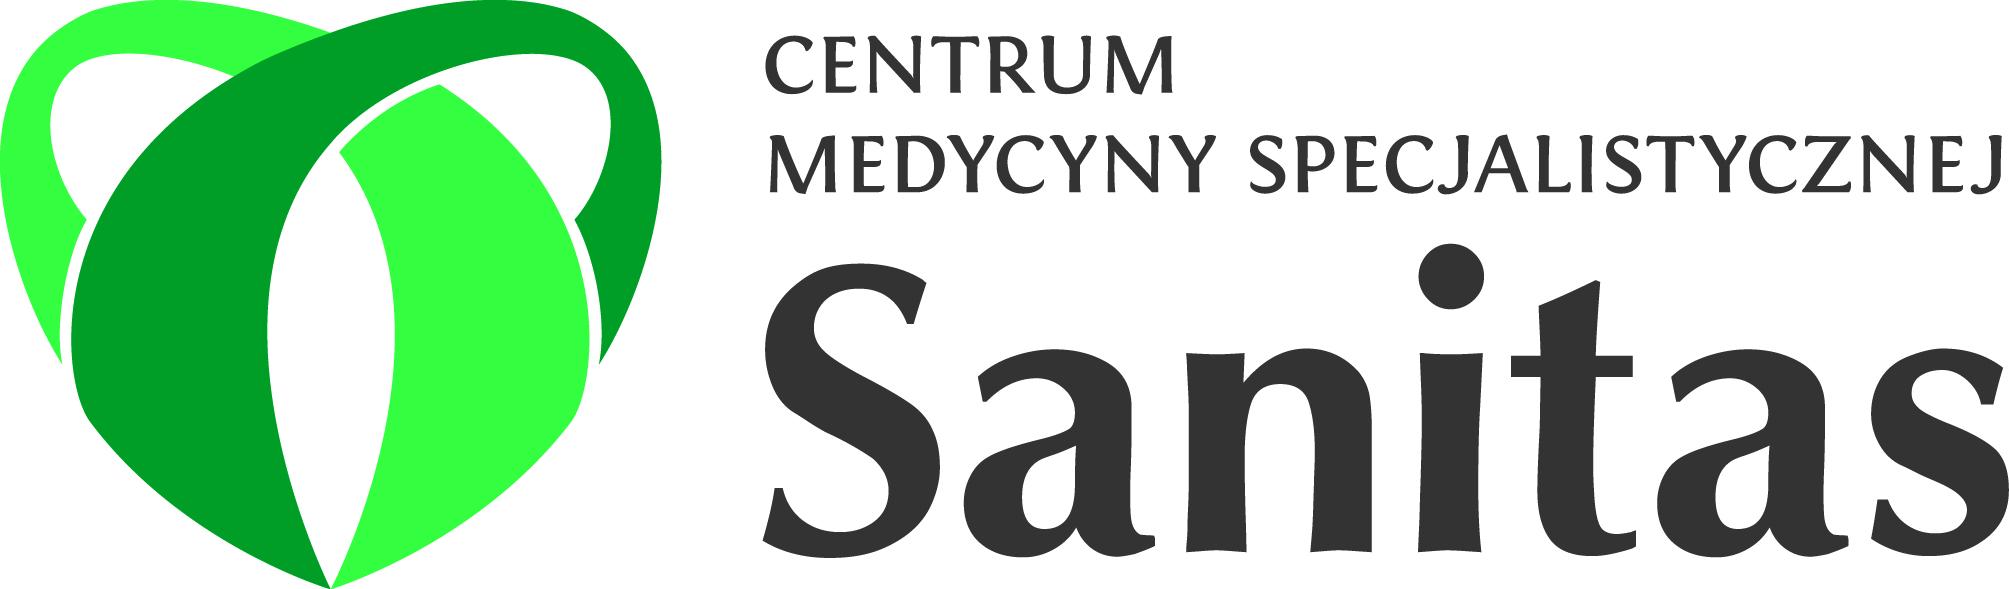 Centrum Medycyny Specjalistycznej Sanitas